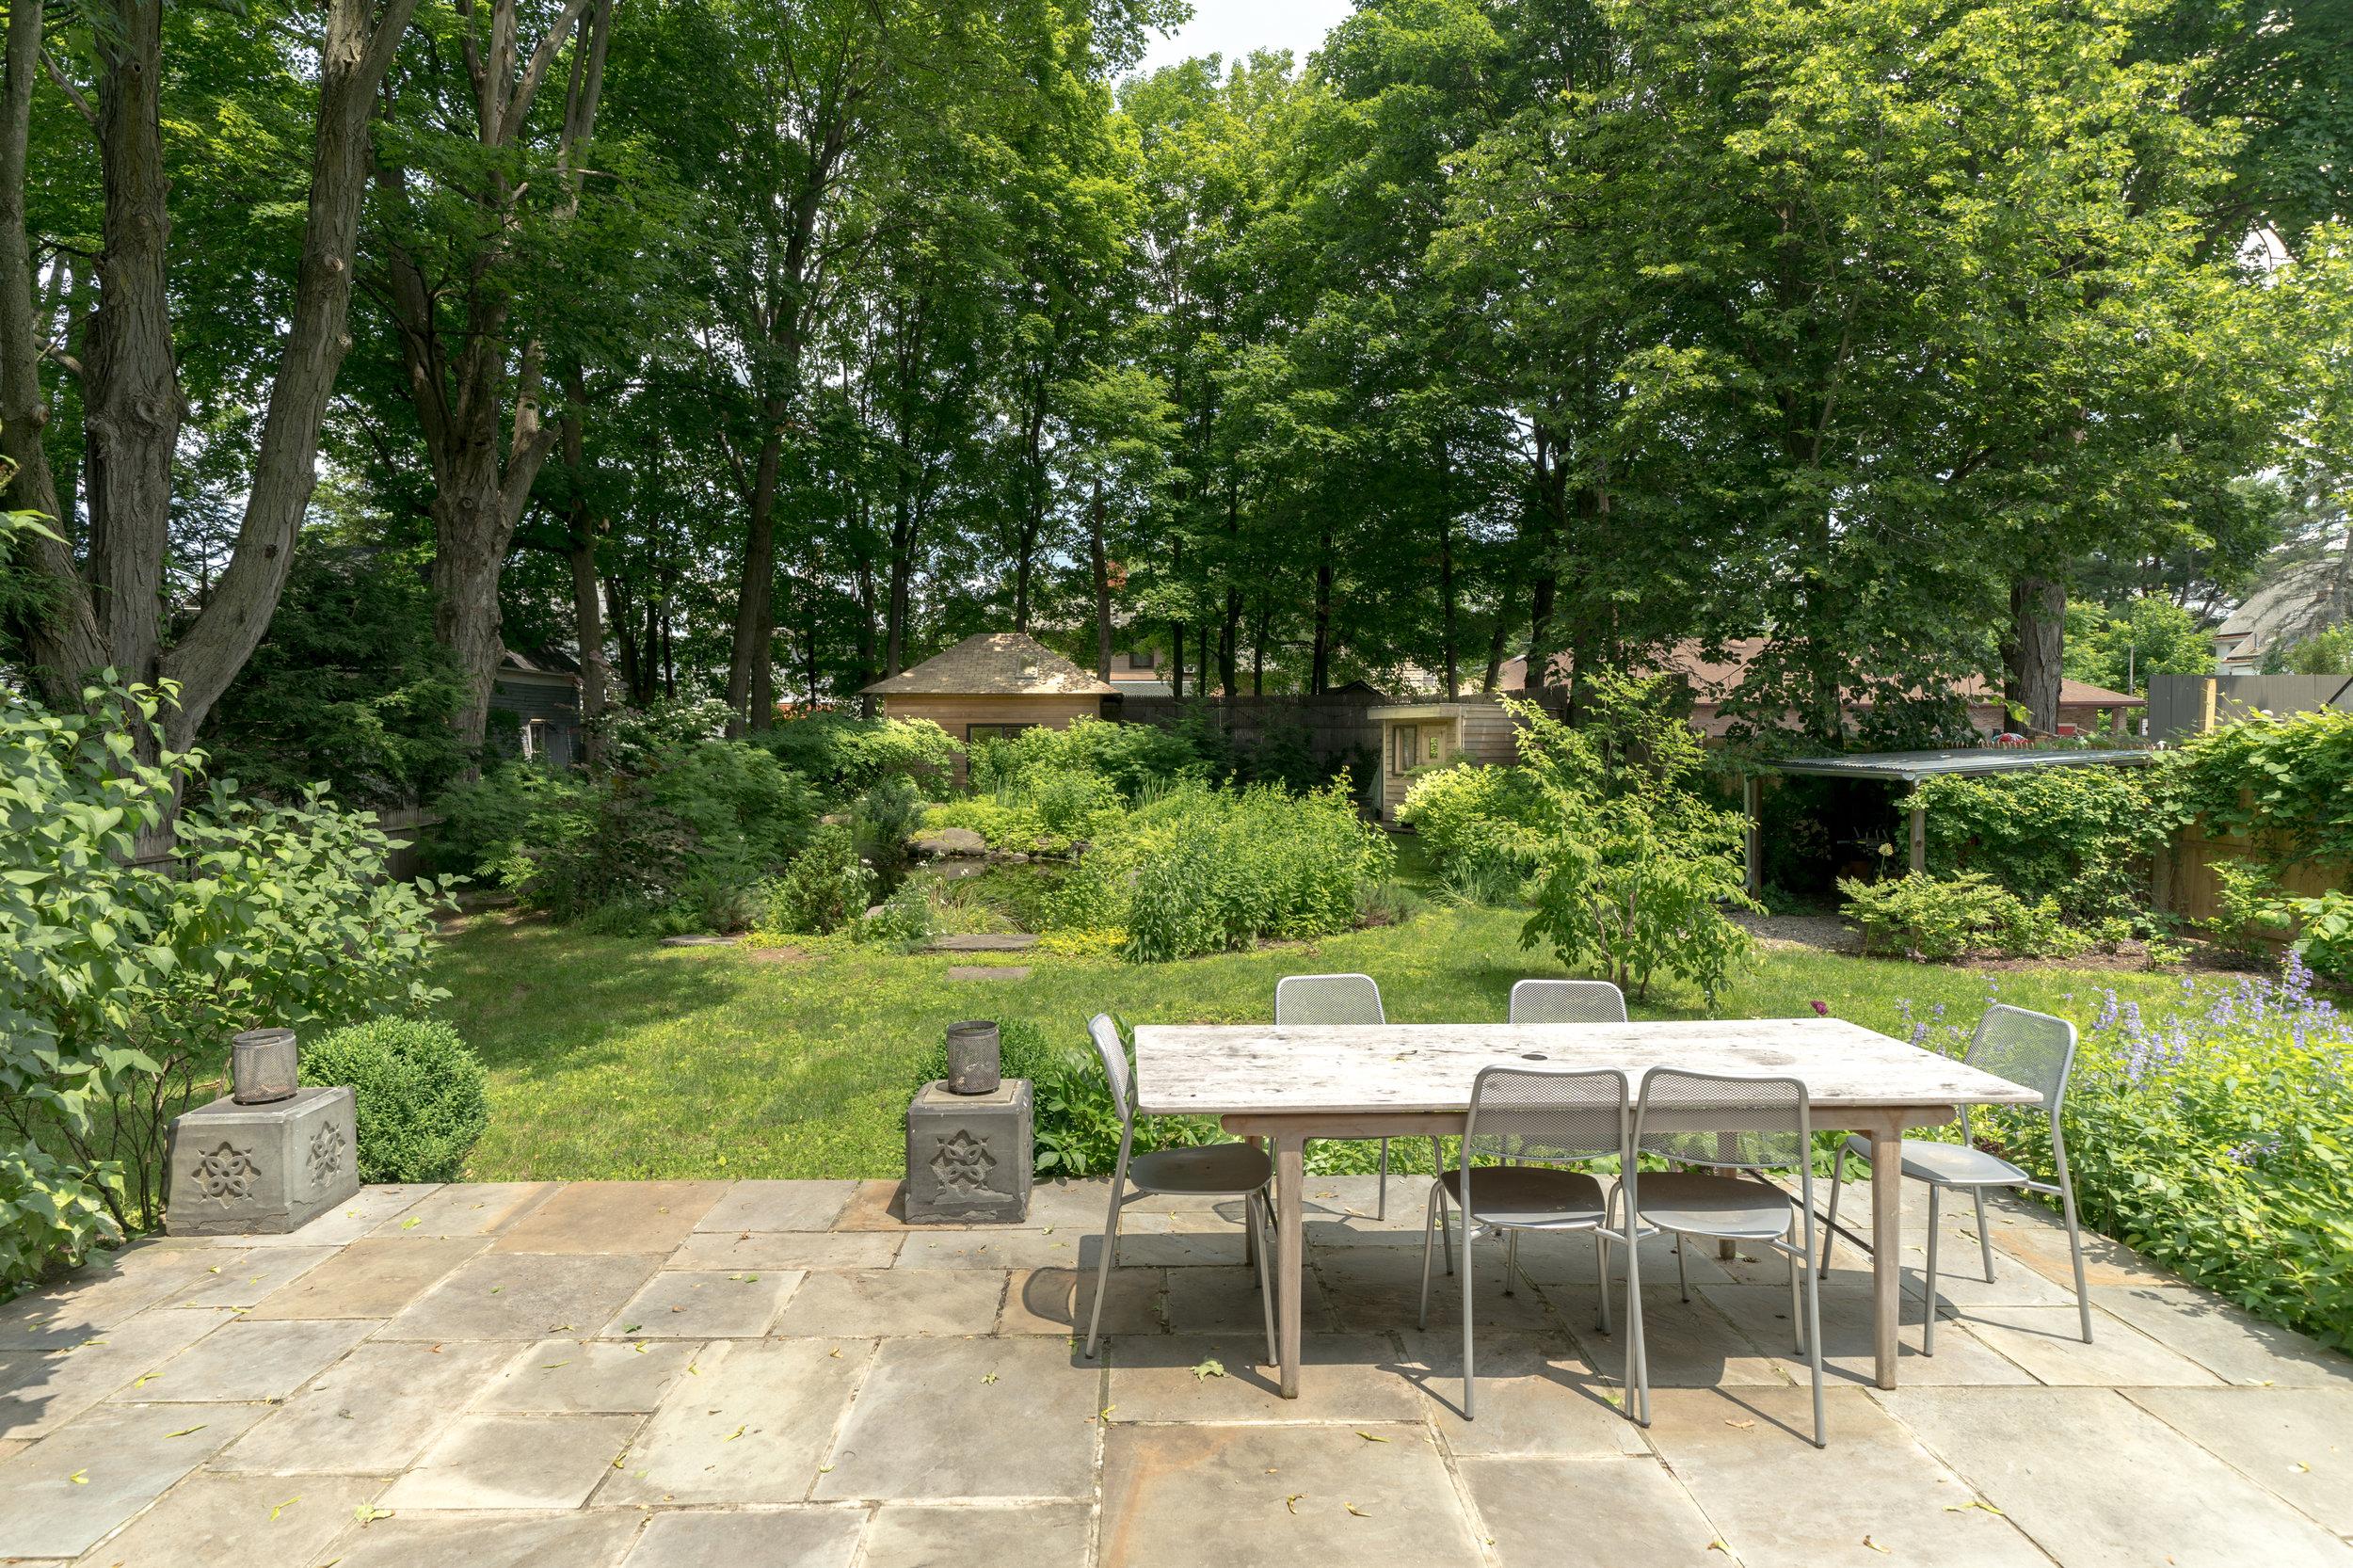 UptownKingston-Garden-Outdoor-Dining.jpg